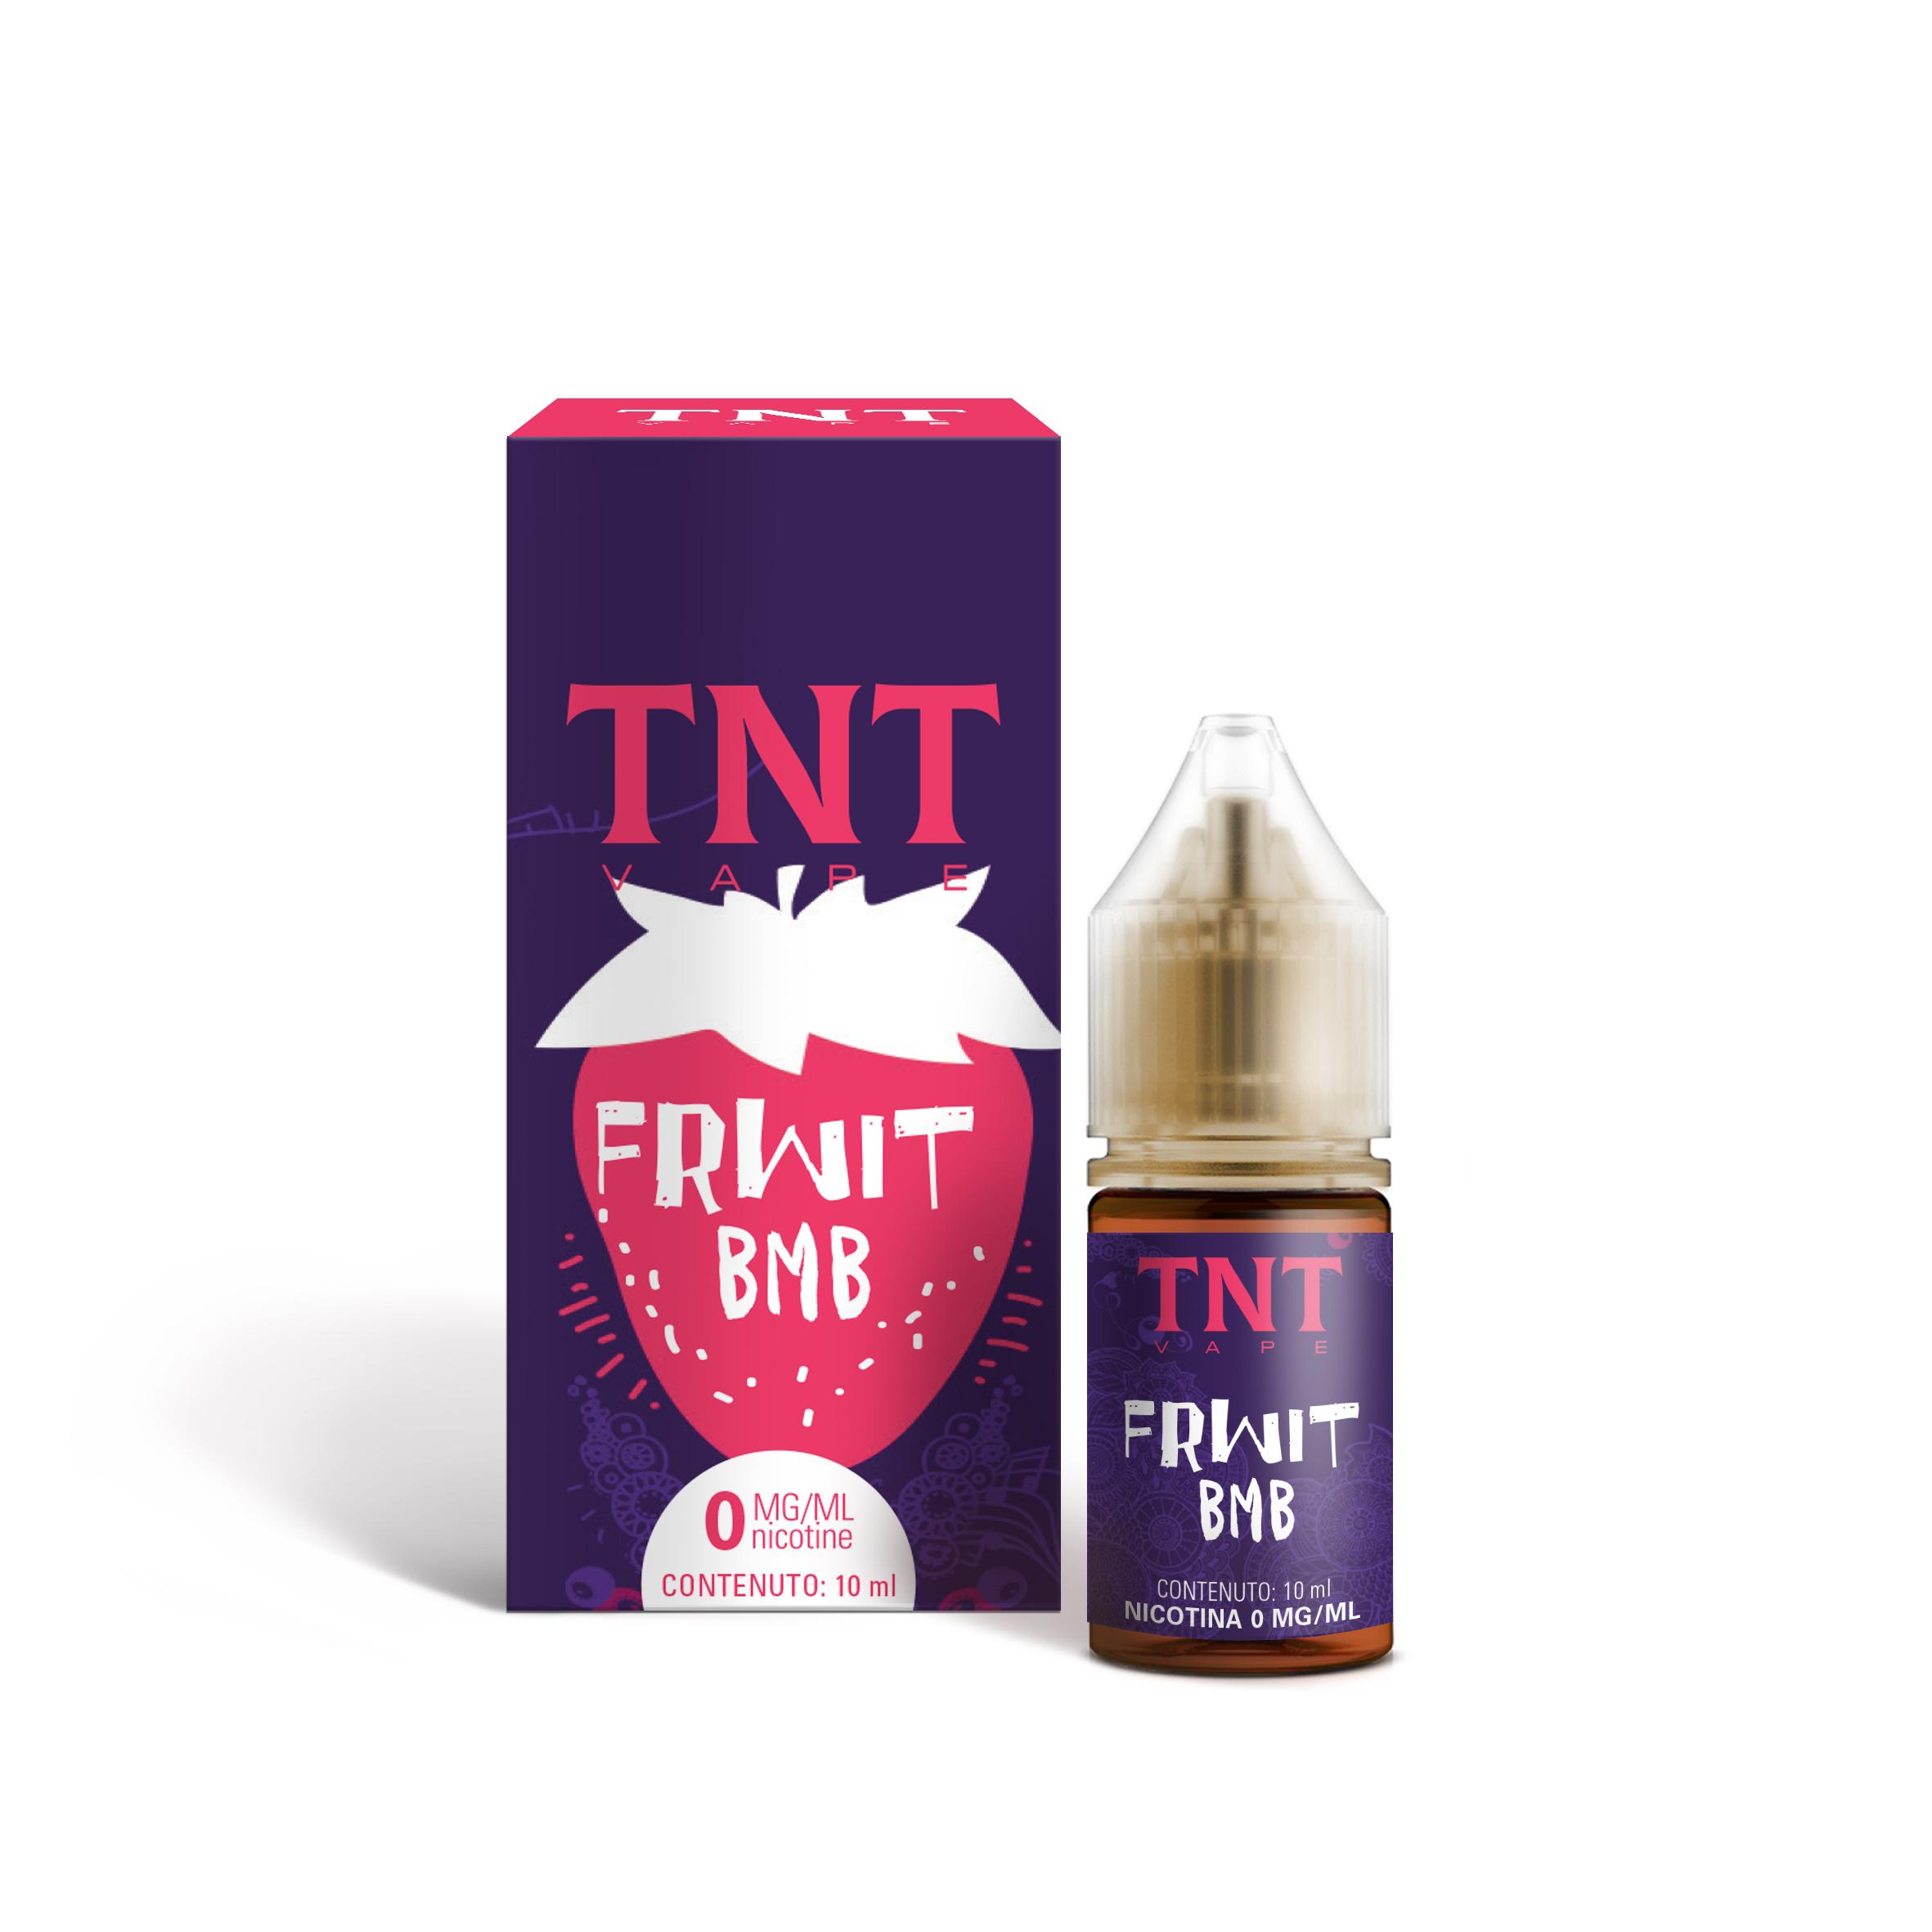 TNT Vape Frwit Bmb 10 ml Liquido Pronto Nicotina